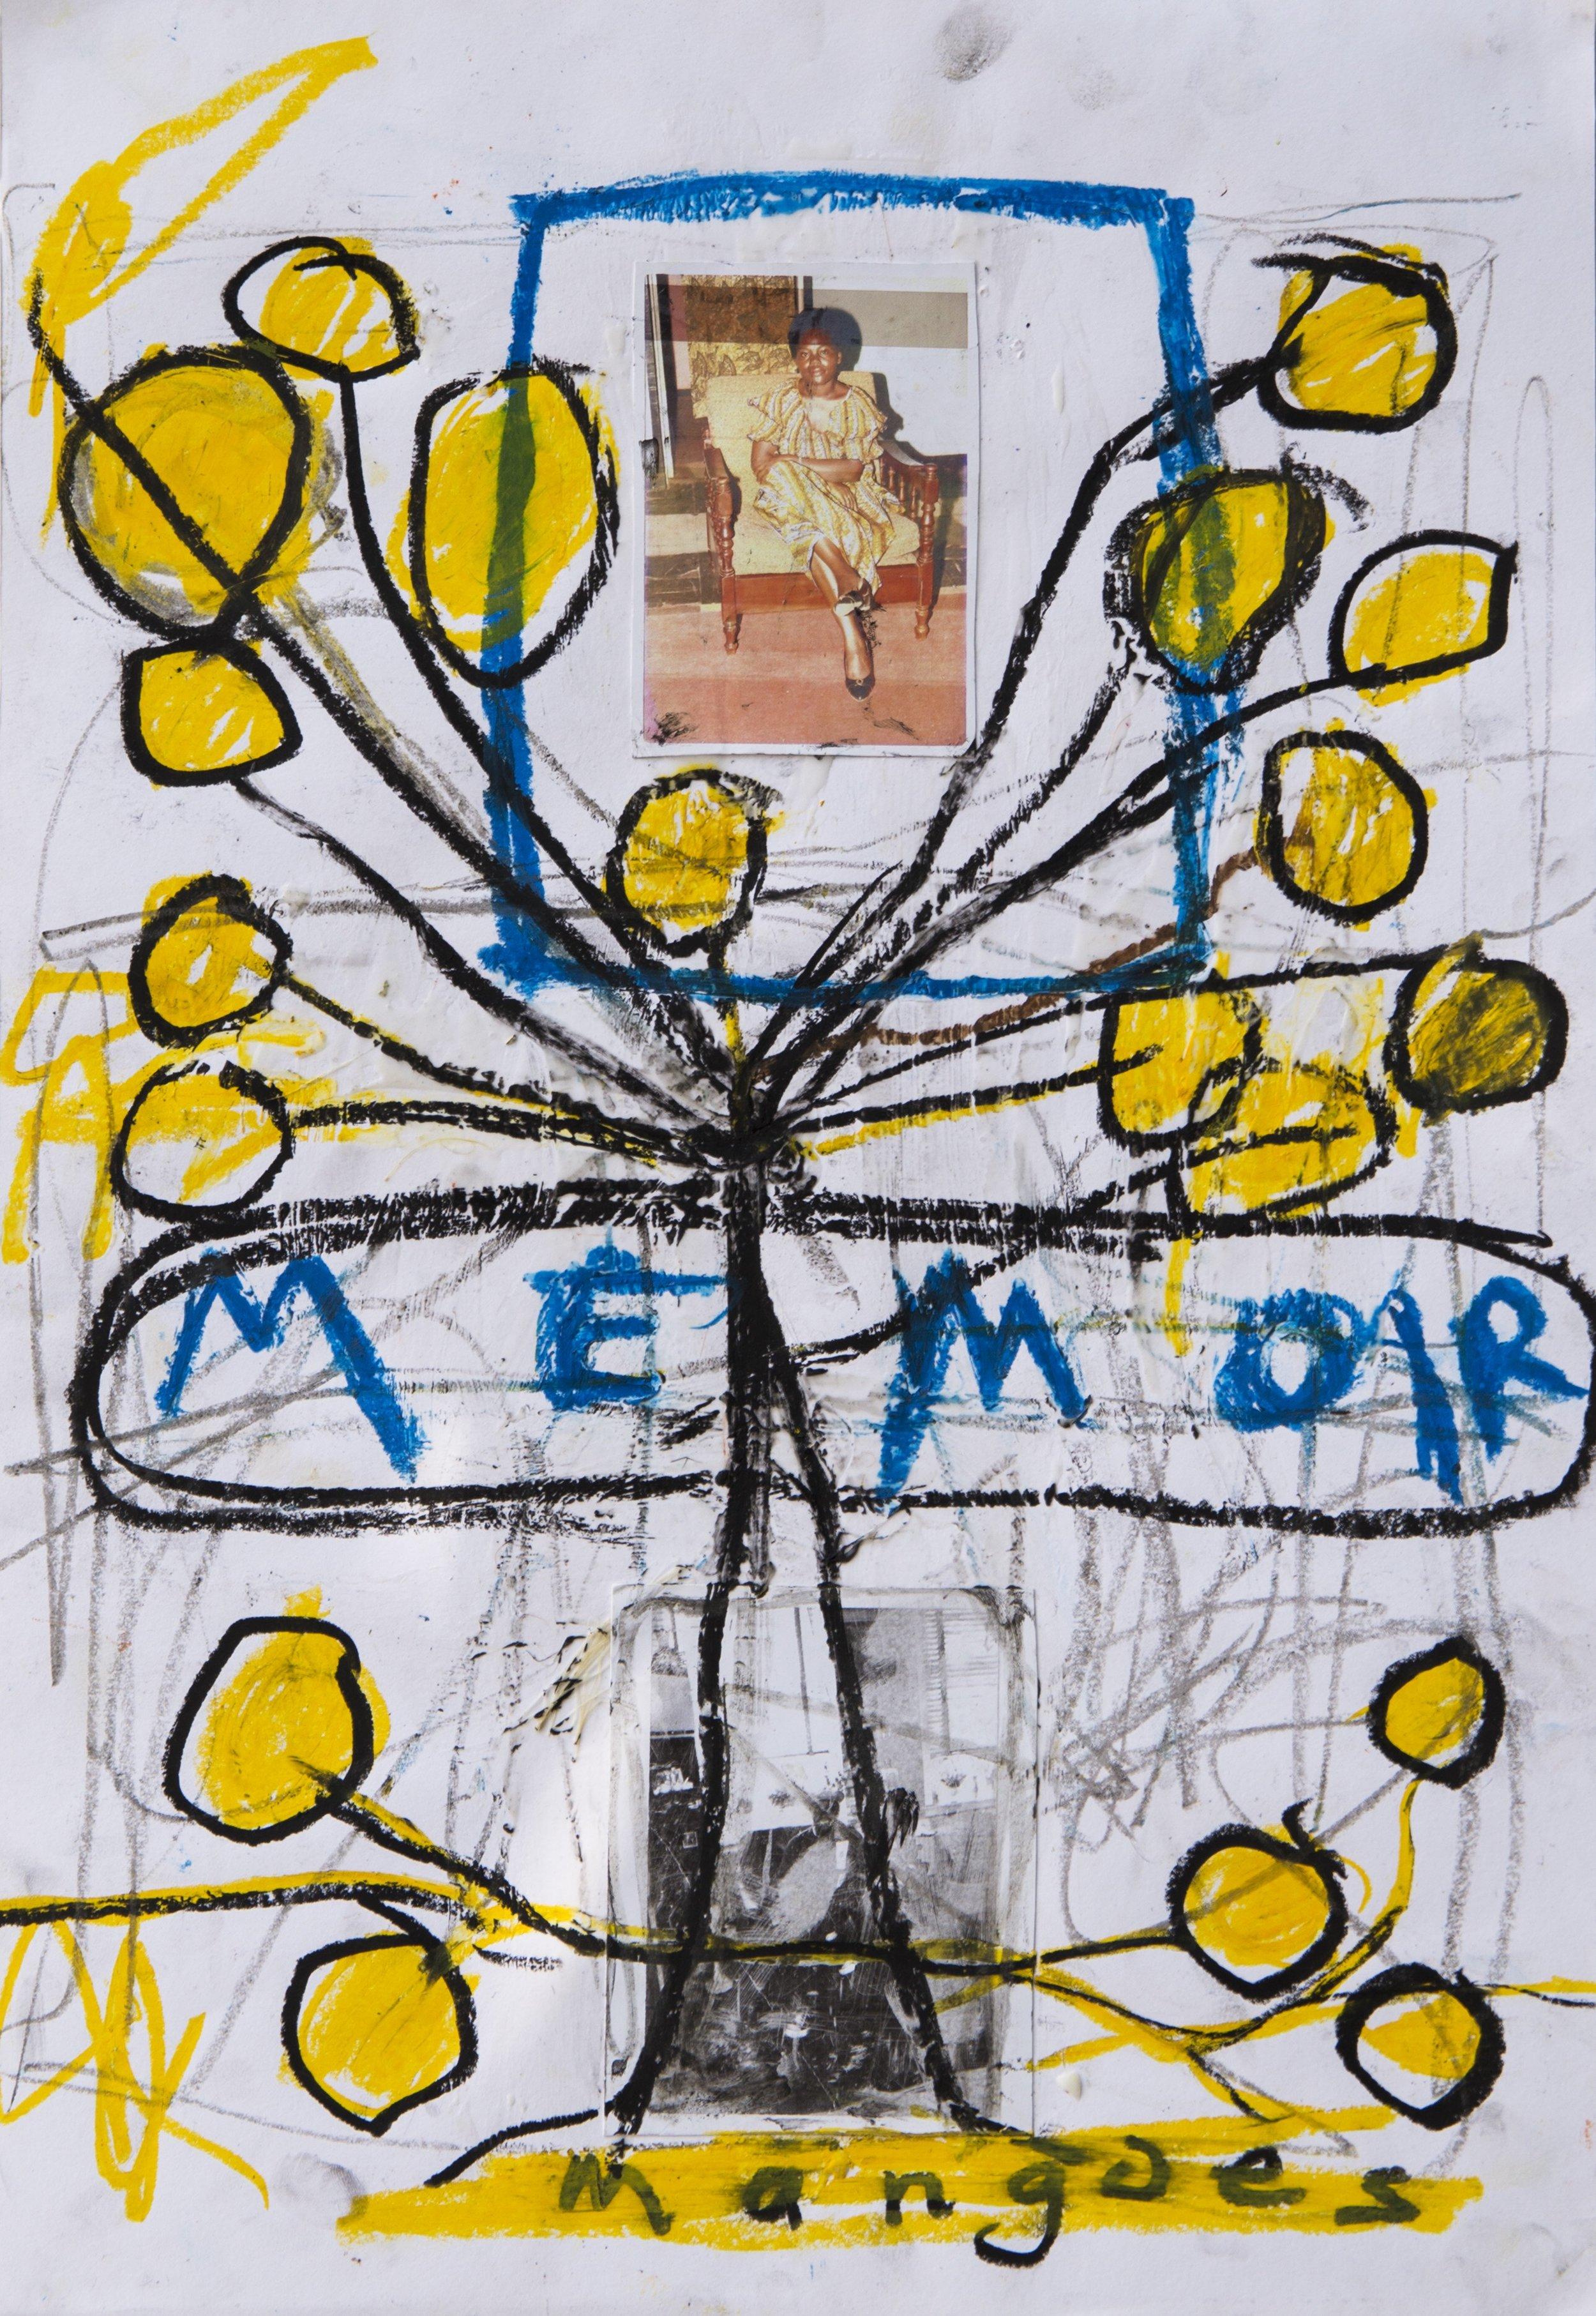 Memoir, 2017, mixed media (charcoal, oil stick, wax) on paper, 60 cm x 42 cm